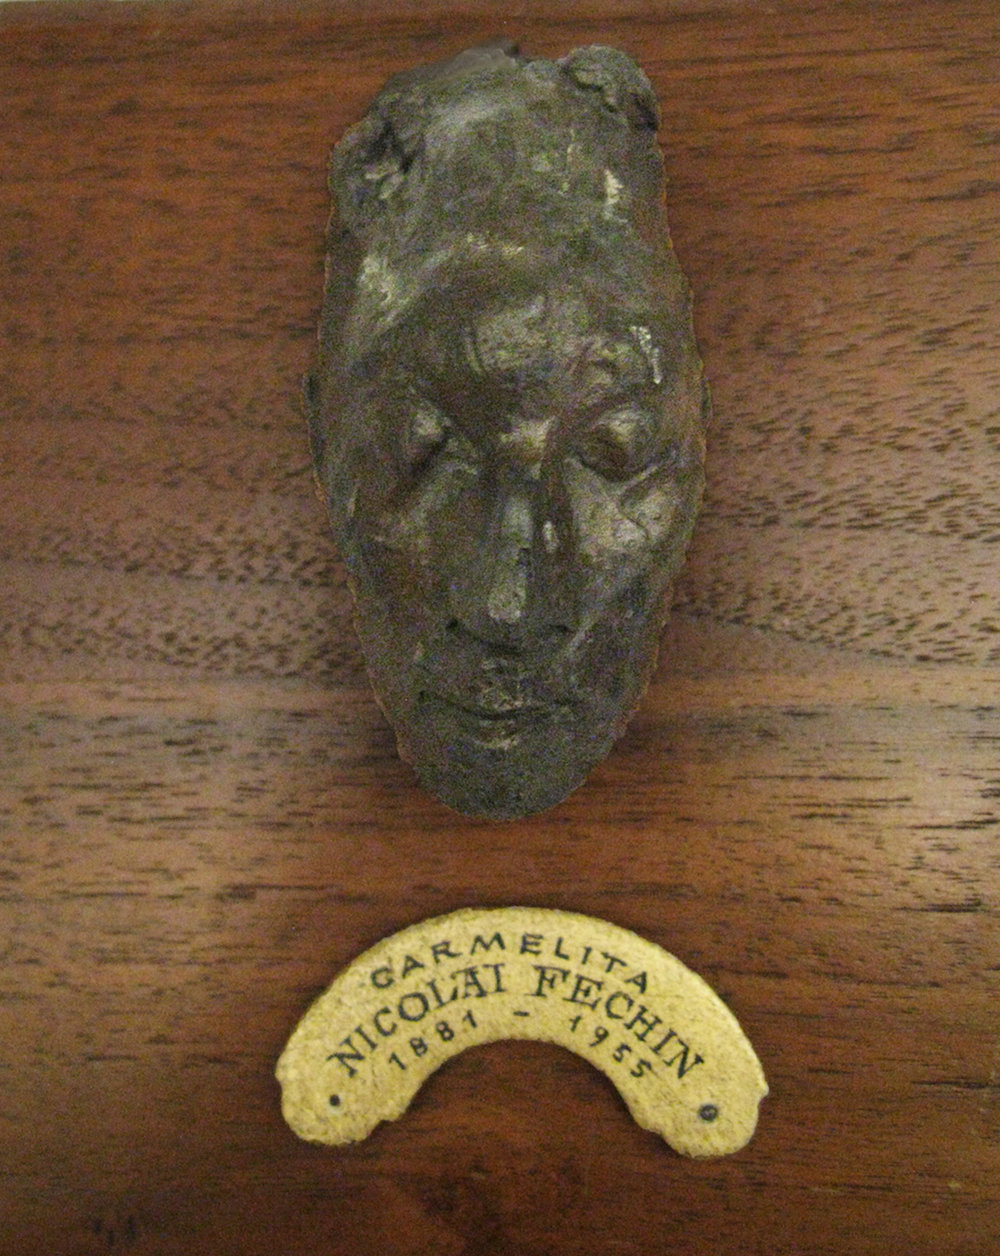 Carmalita Bronze 3.5 x 1.5